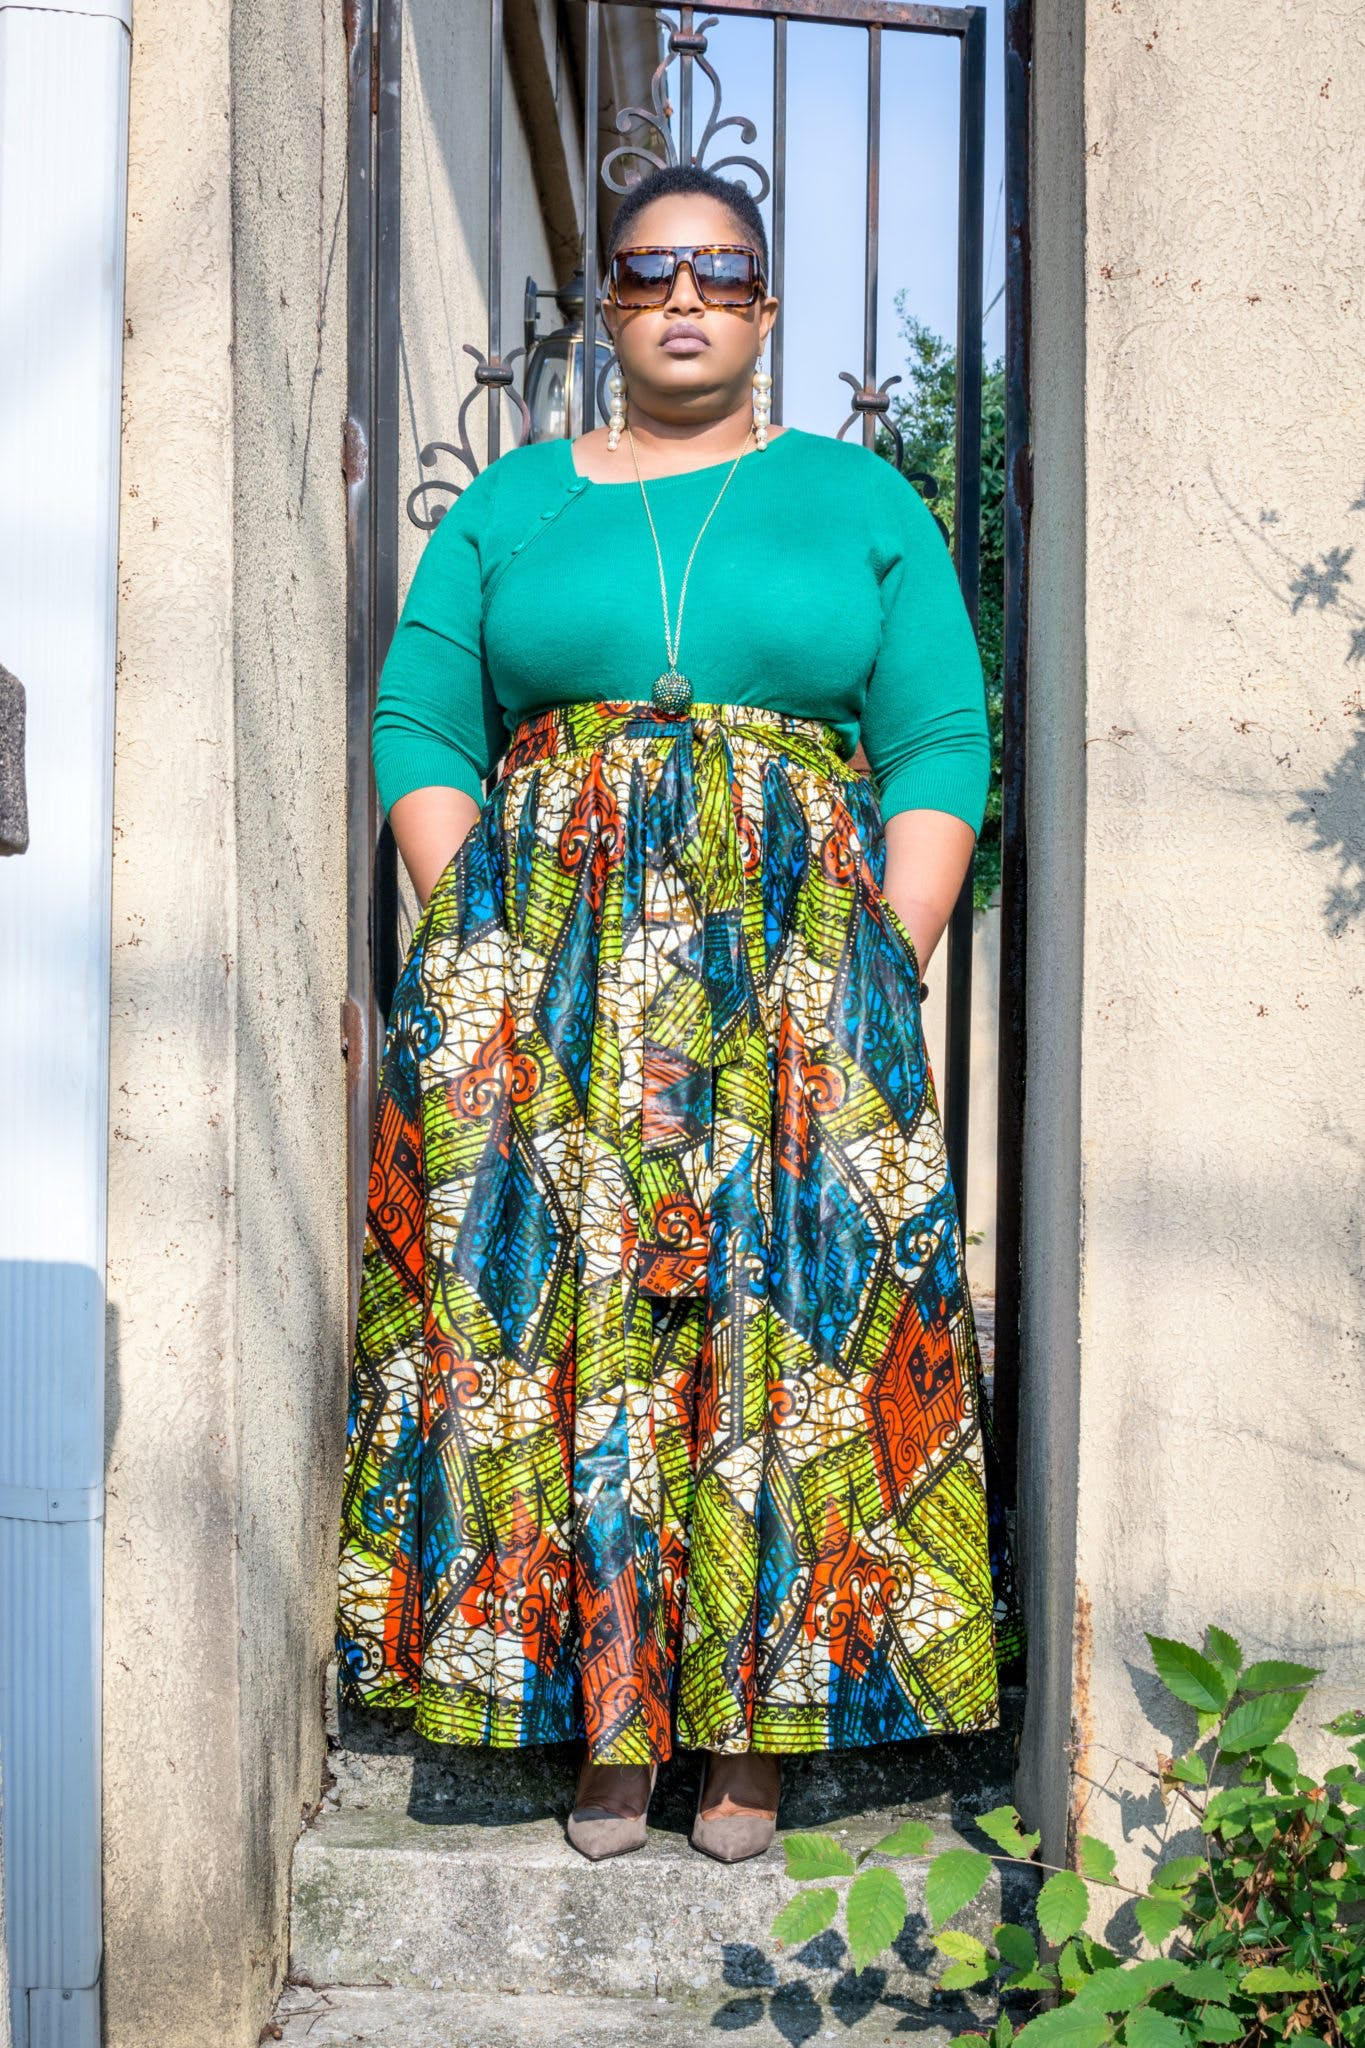 Woman Wearing Green Long-sleeved Shirt and Printed Skirt